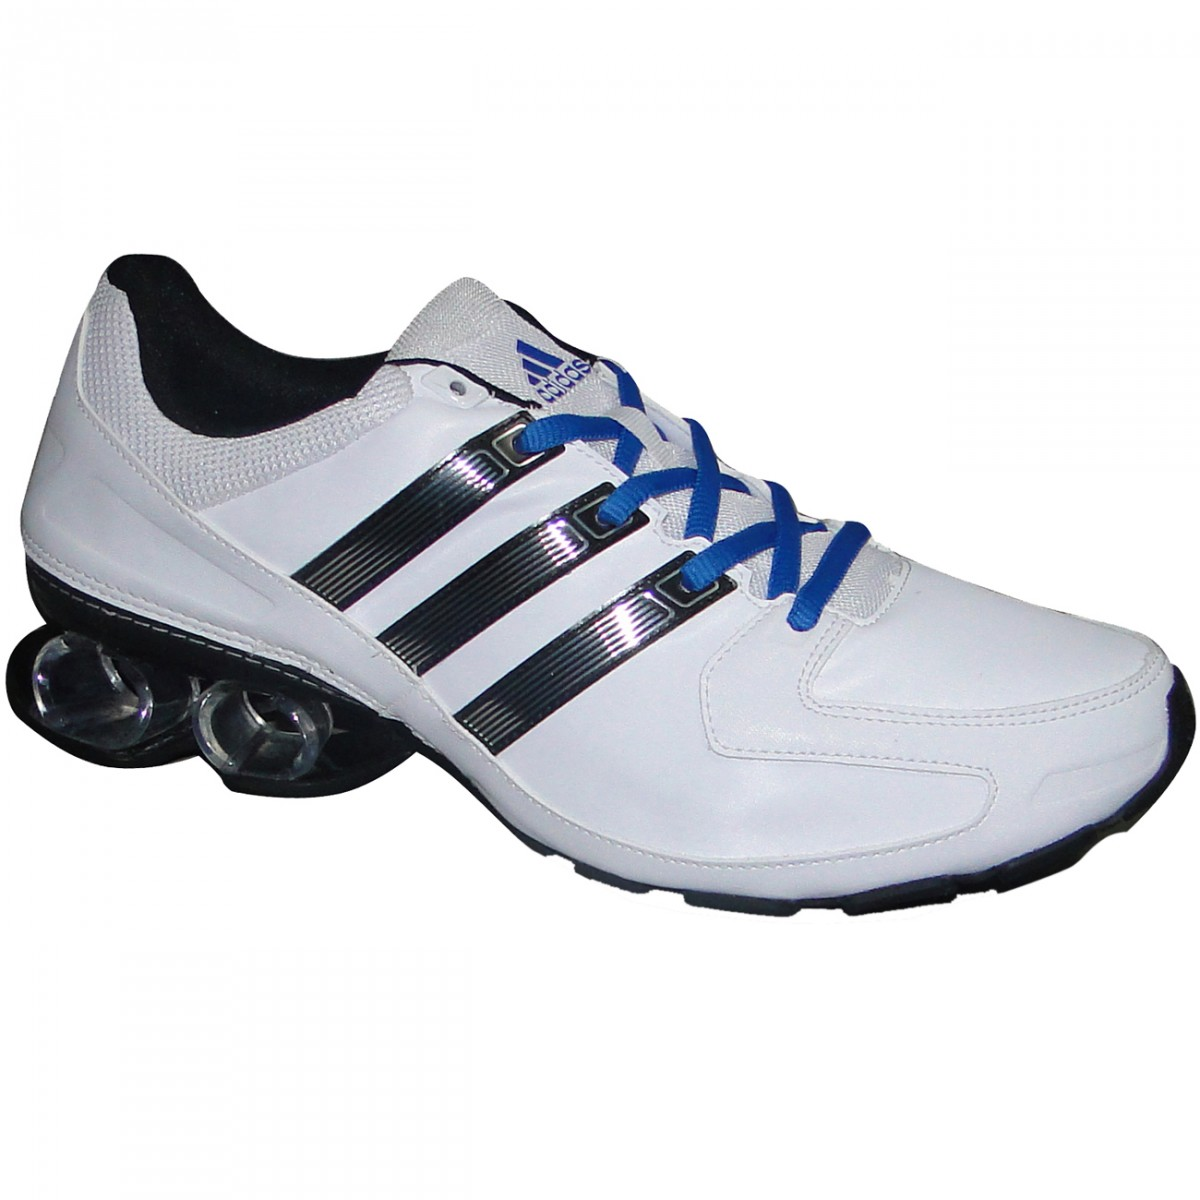 8bc07e5e36f03 Tenis Adidas Komet Q34320 - Branco/Preto/Azul - Chuteira Nike ...